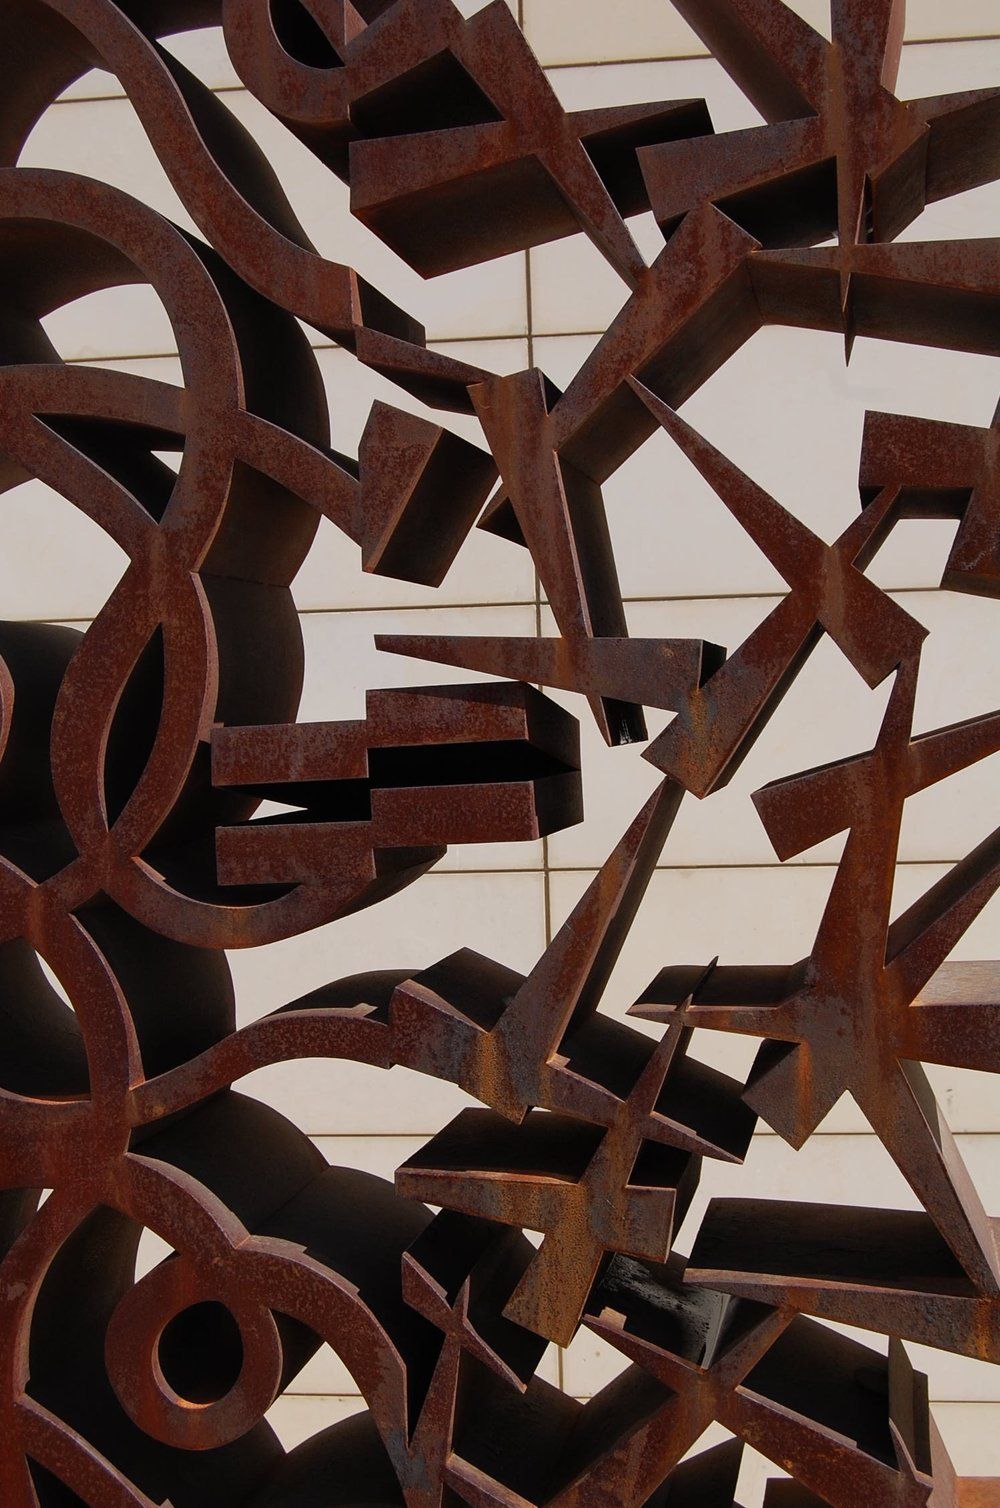 Sculpture, 2013